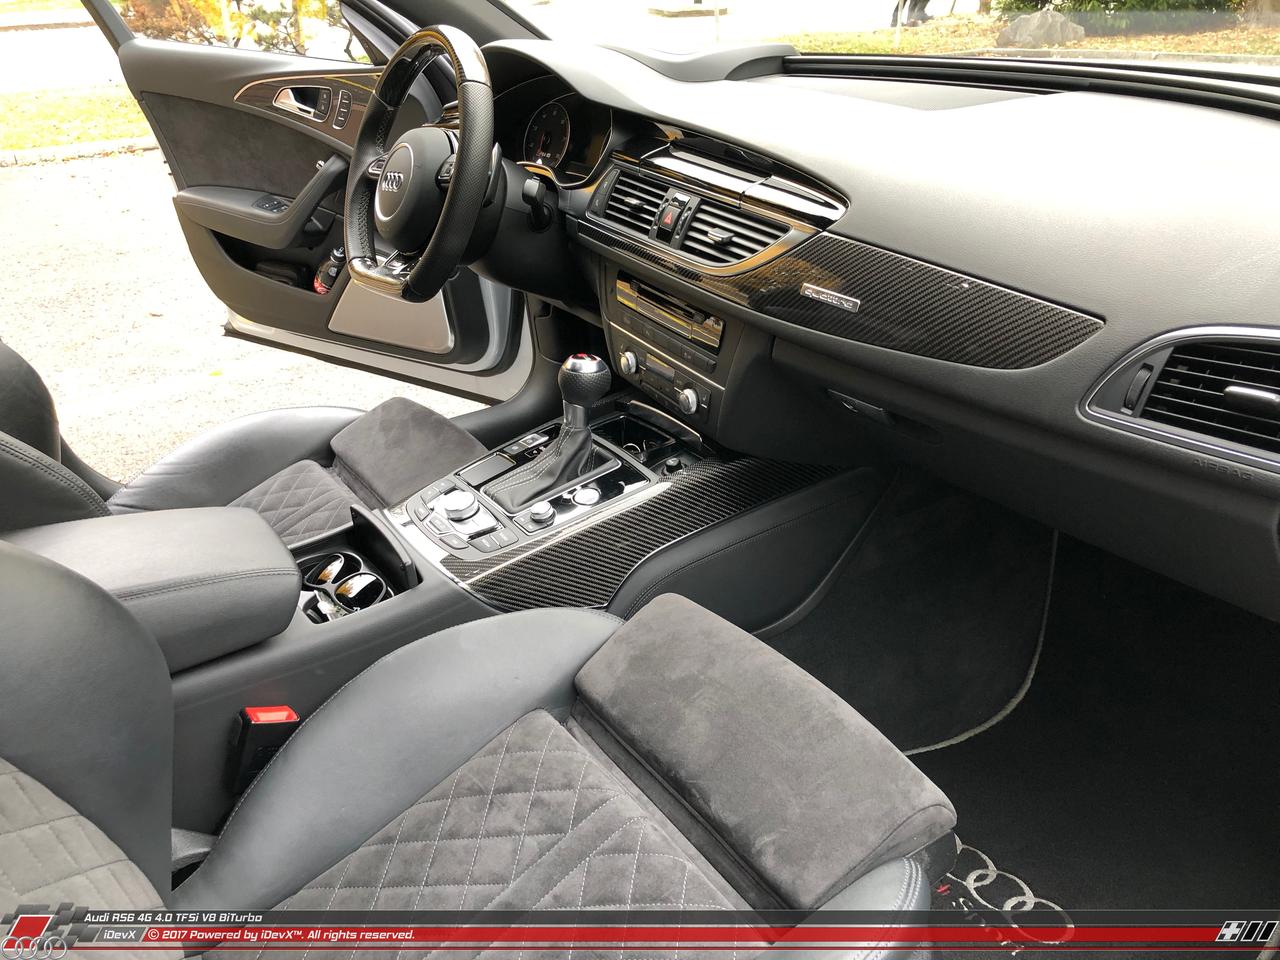 10_11.2018_Audi-RS6_iDevX_007.png